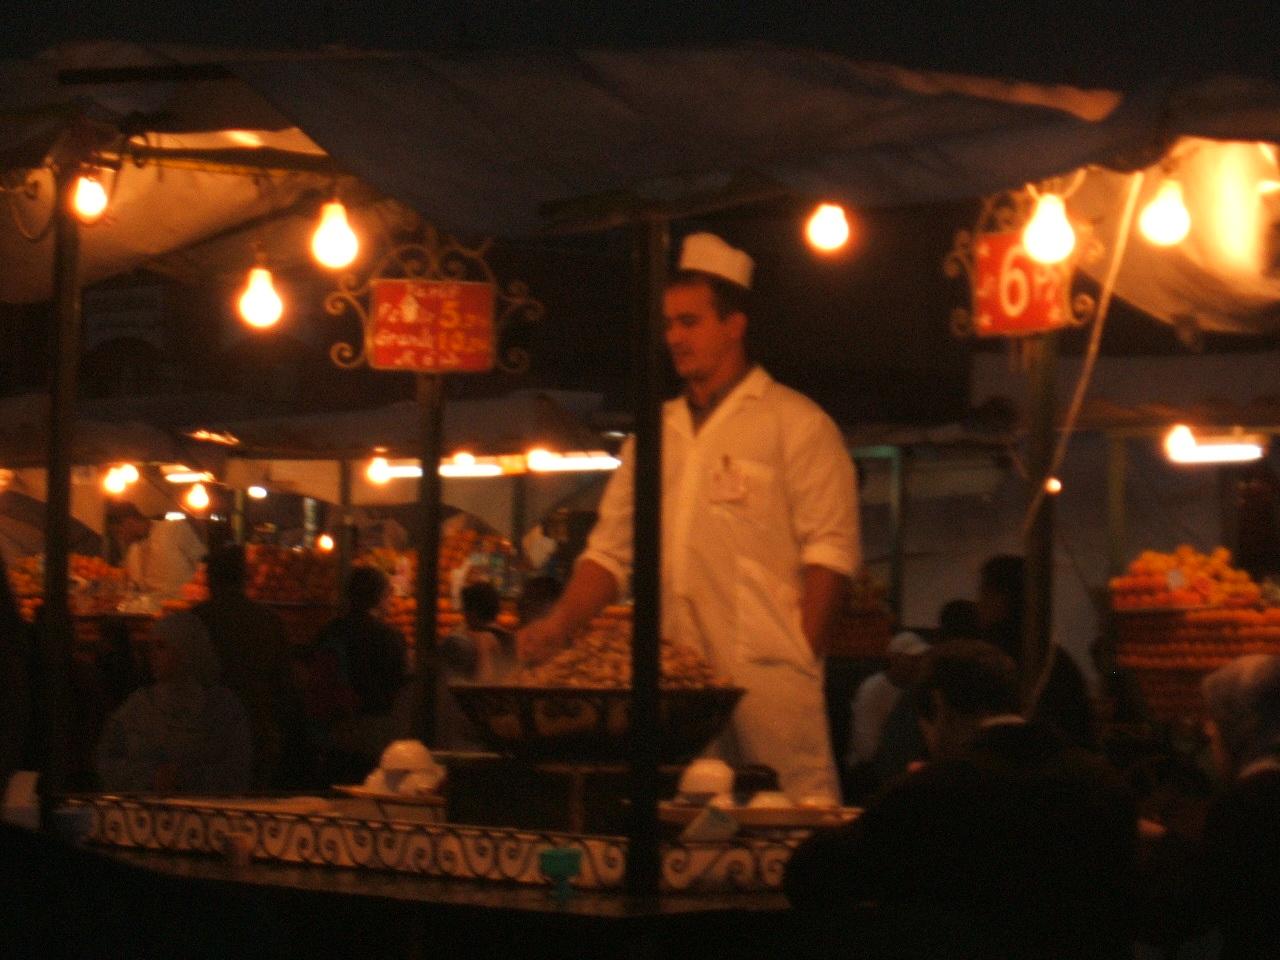 Djeema el Fna - cook at number 1 stall